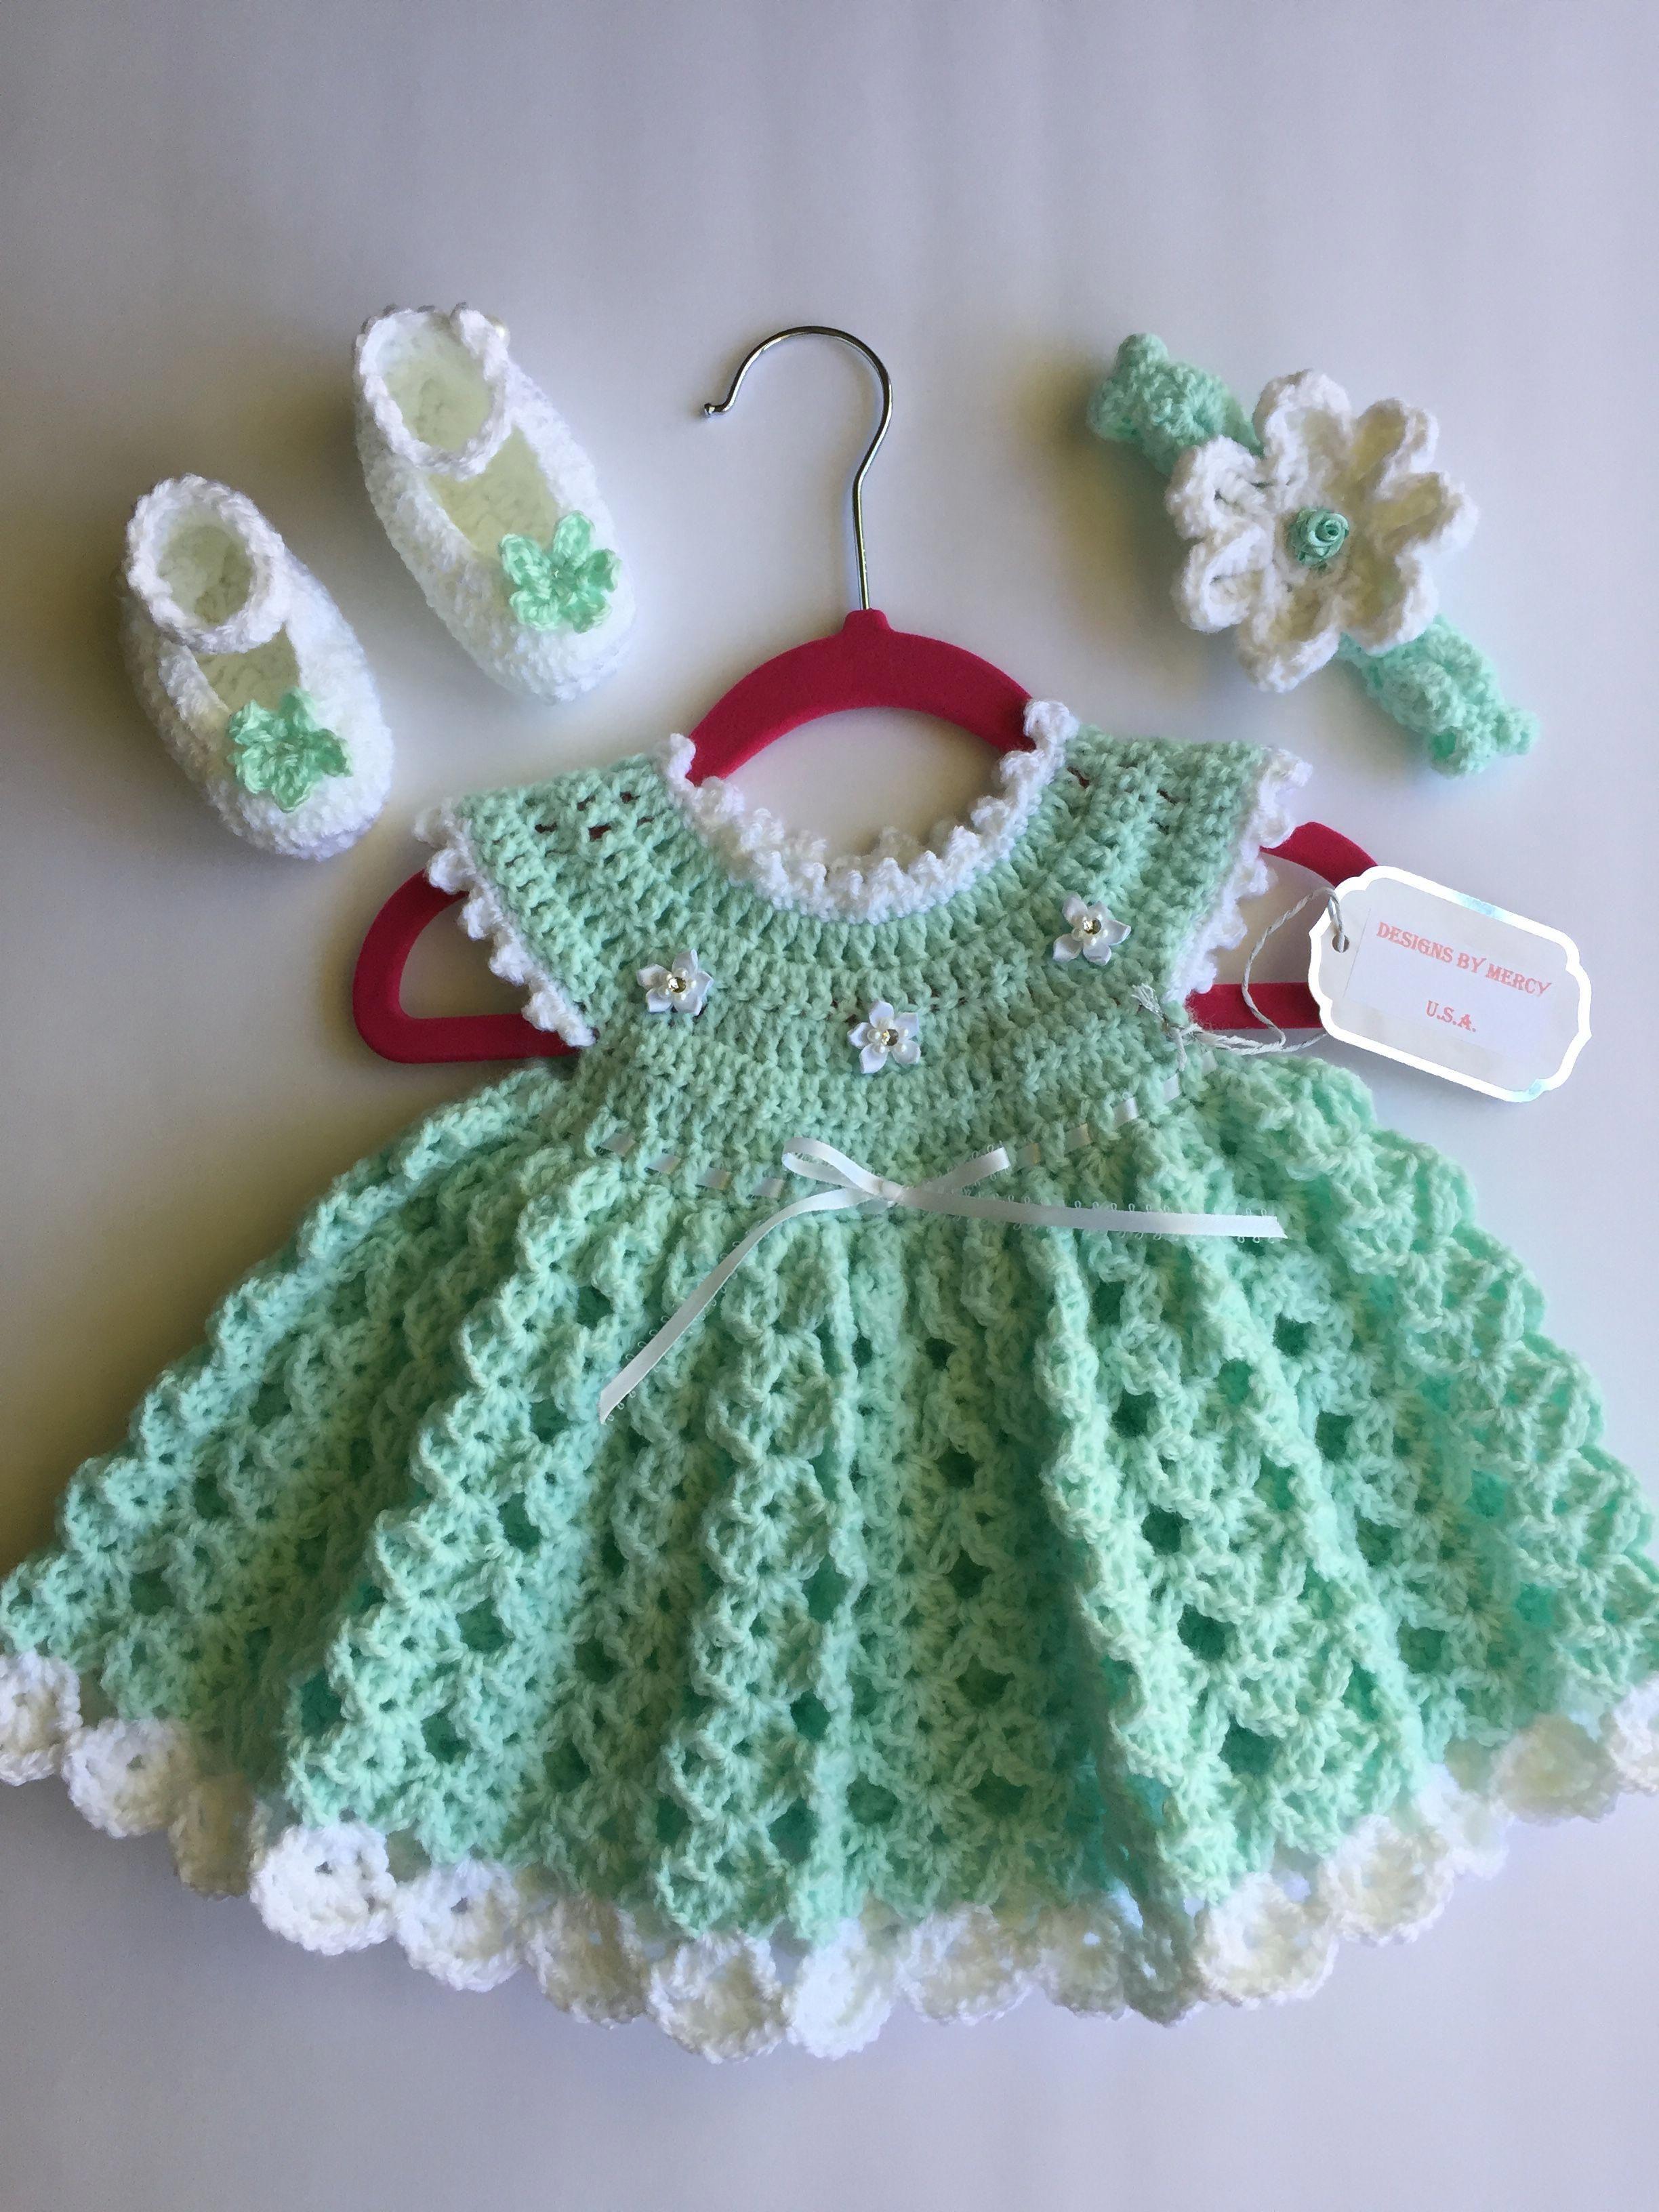 ddf5d27c5f6b Teal Crochet Baby Dress Teal Crochet Baby Headband White Crochet ...